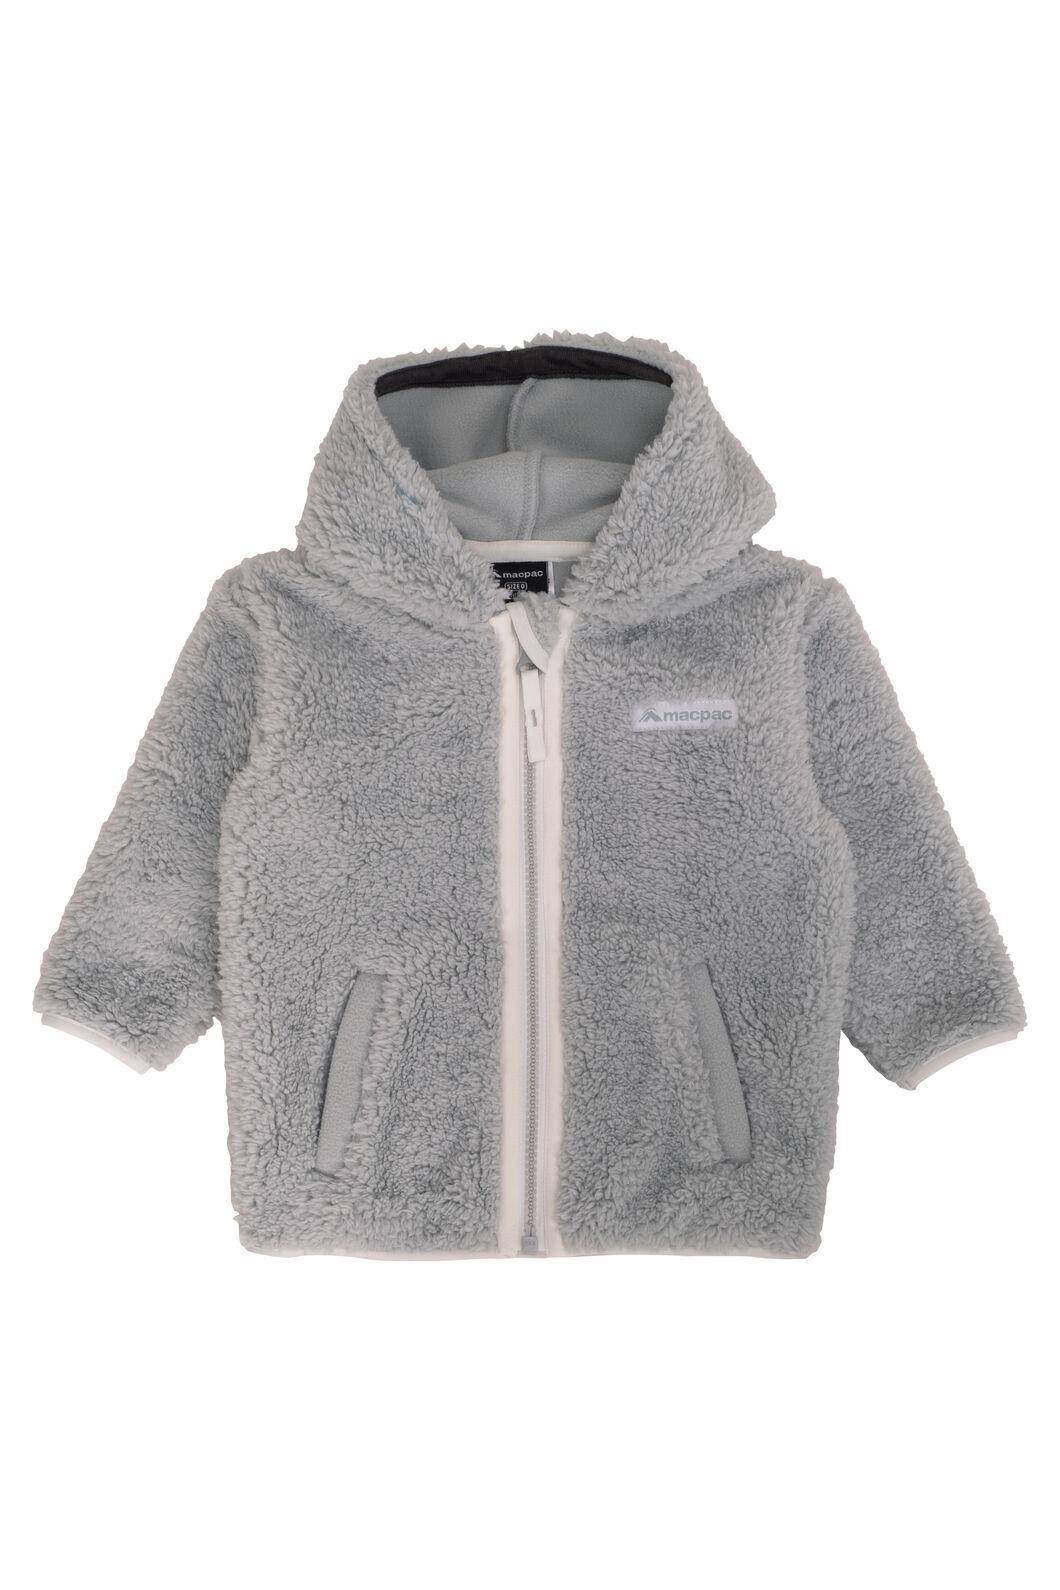 Macpac Acorn Fleece Jacket — Baby, High Rise, hi-res